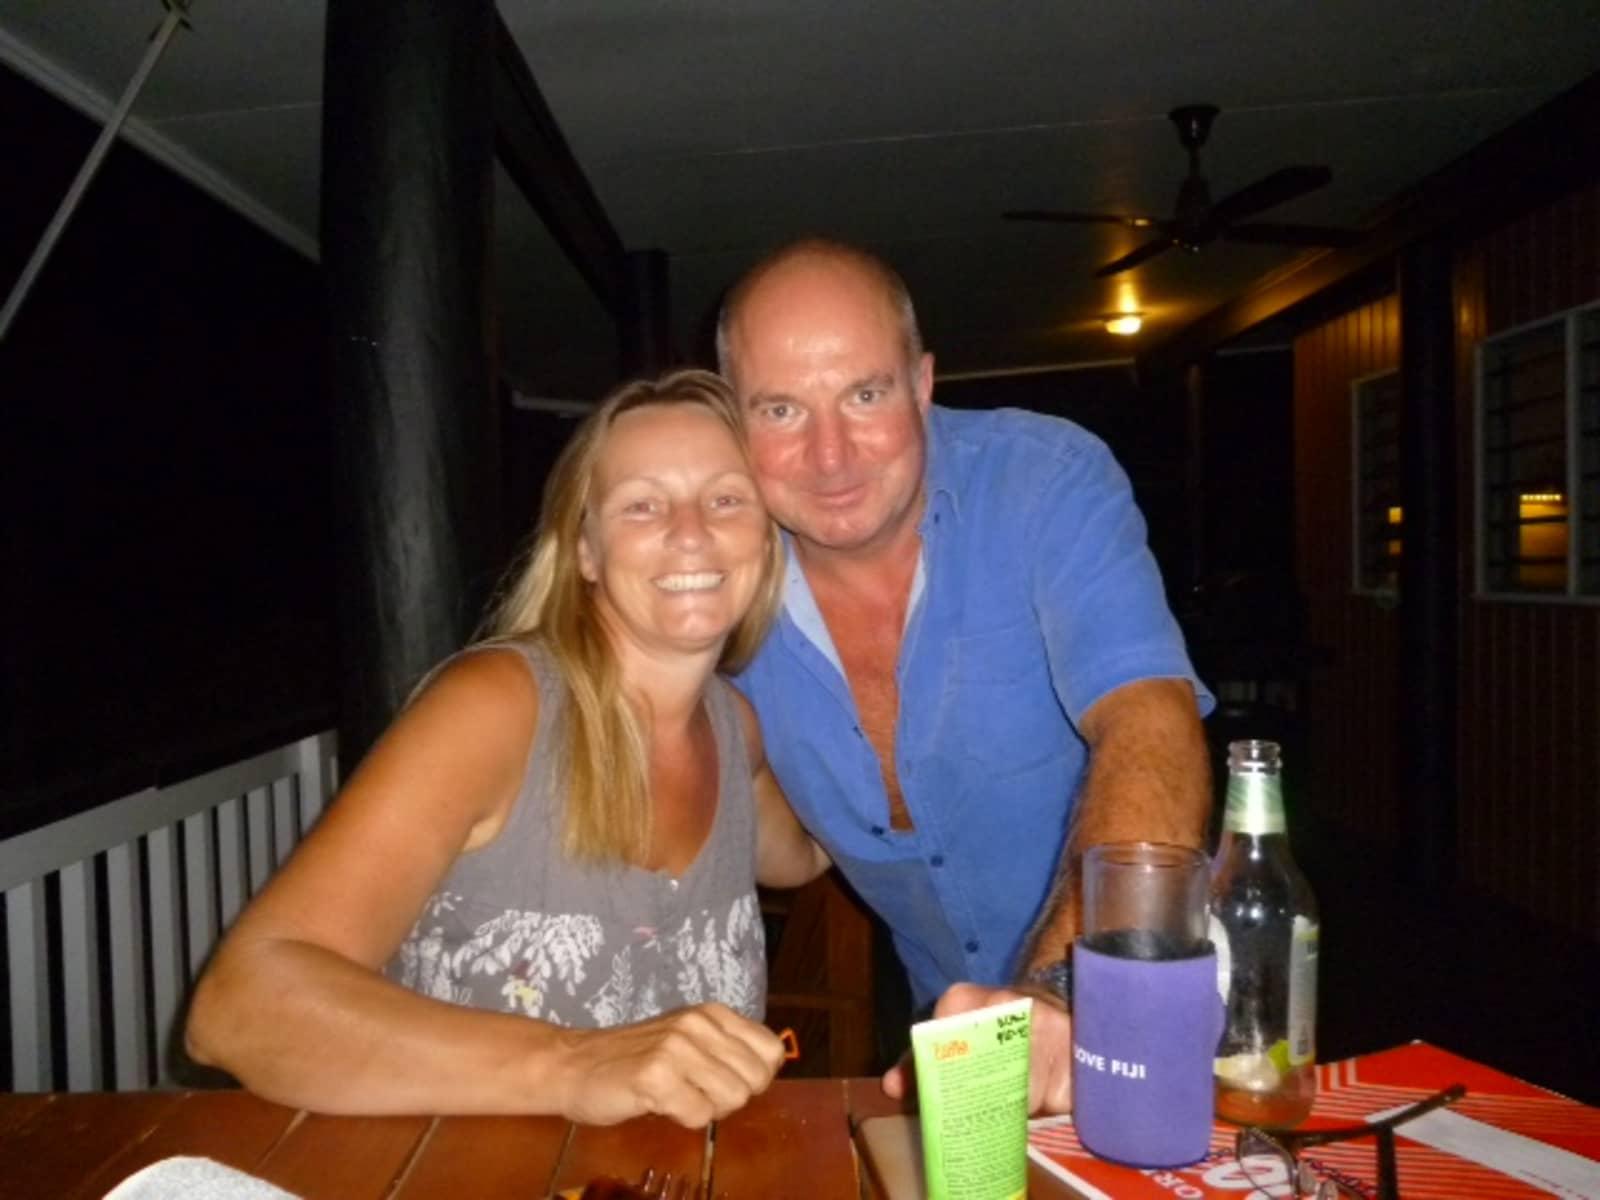 Sheila & Steve from Carisbrooke, United Kingdom